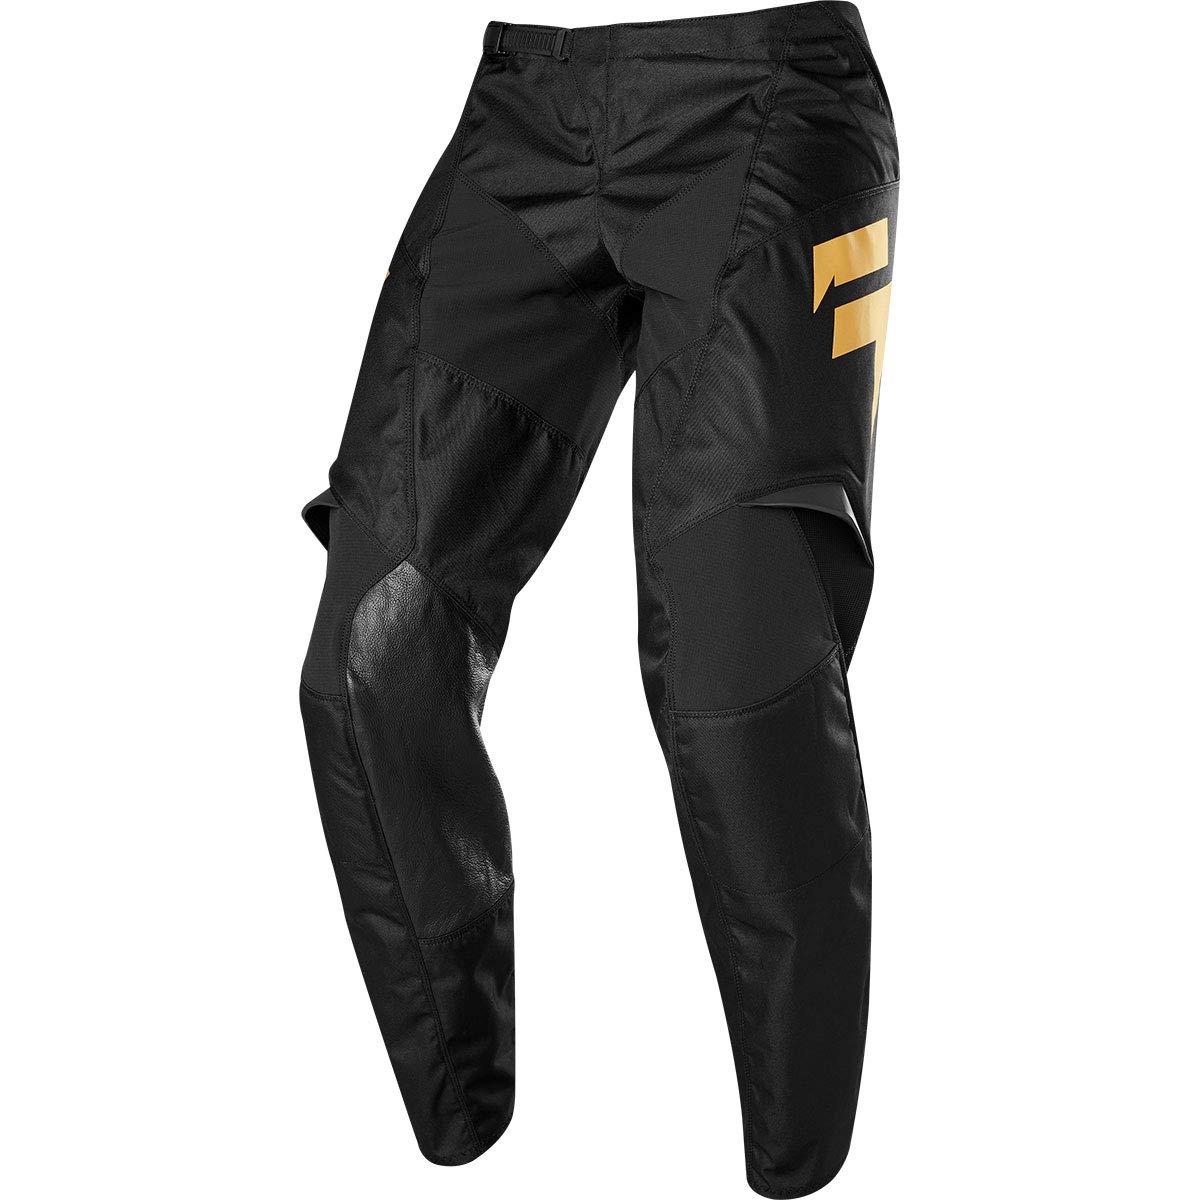 Shift Racing Whit3 Label Muerte LE Mens Off-Road Motorcycle Pants Black//Gold 38